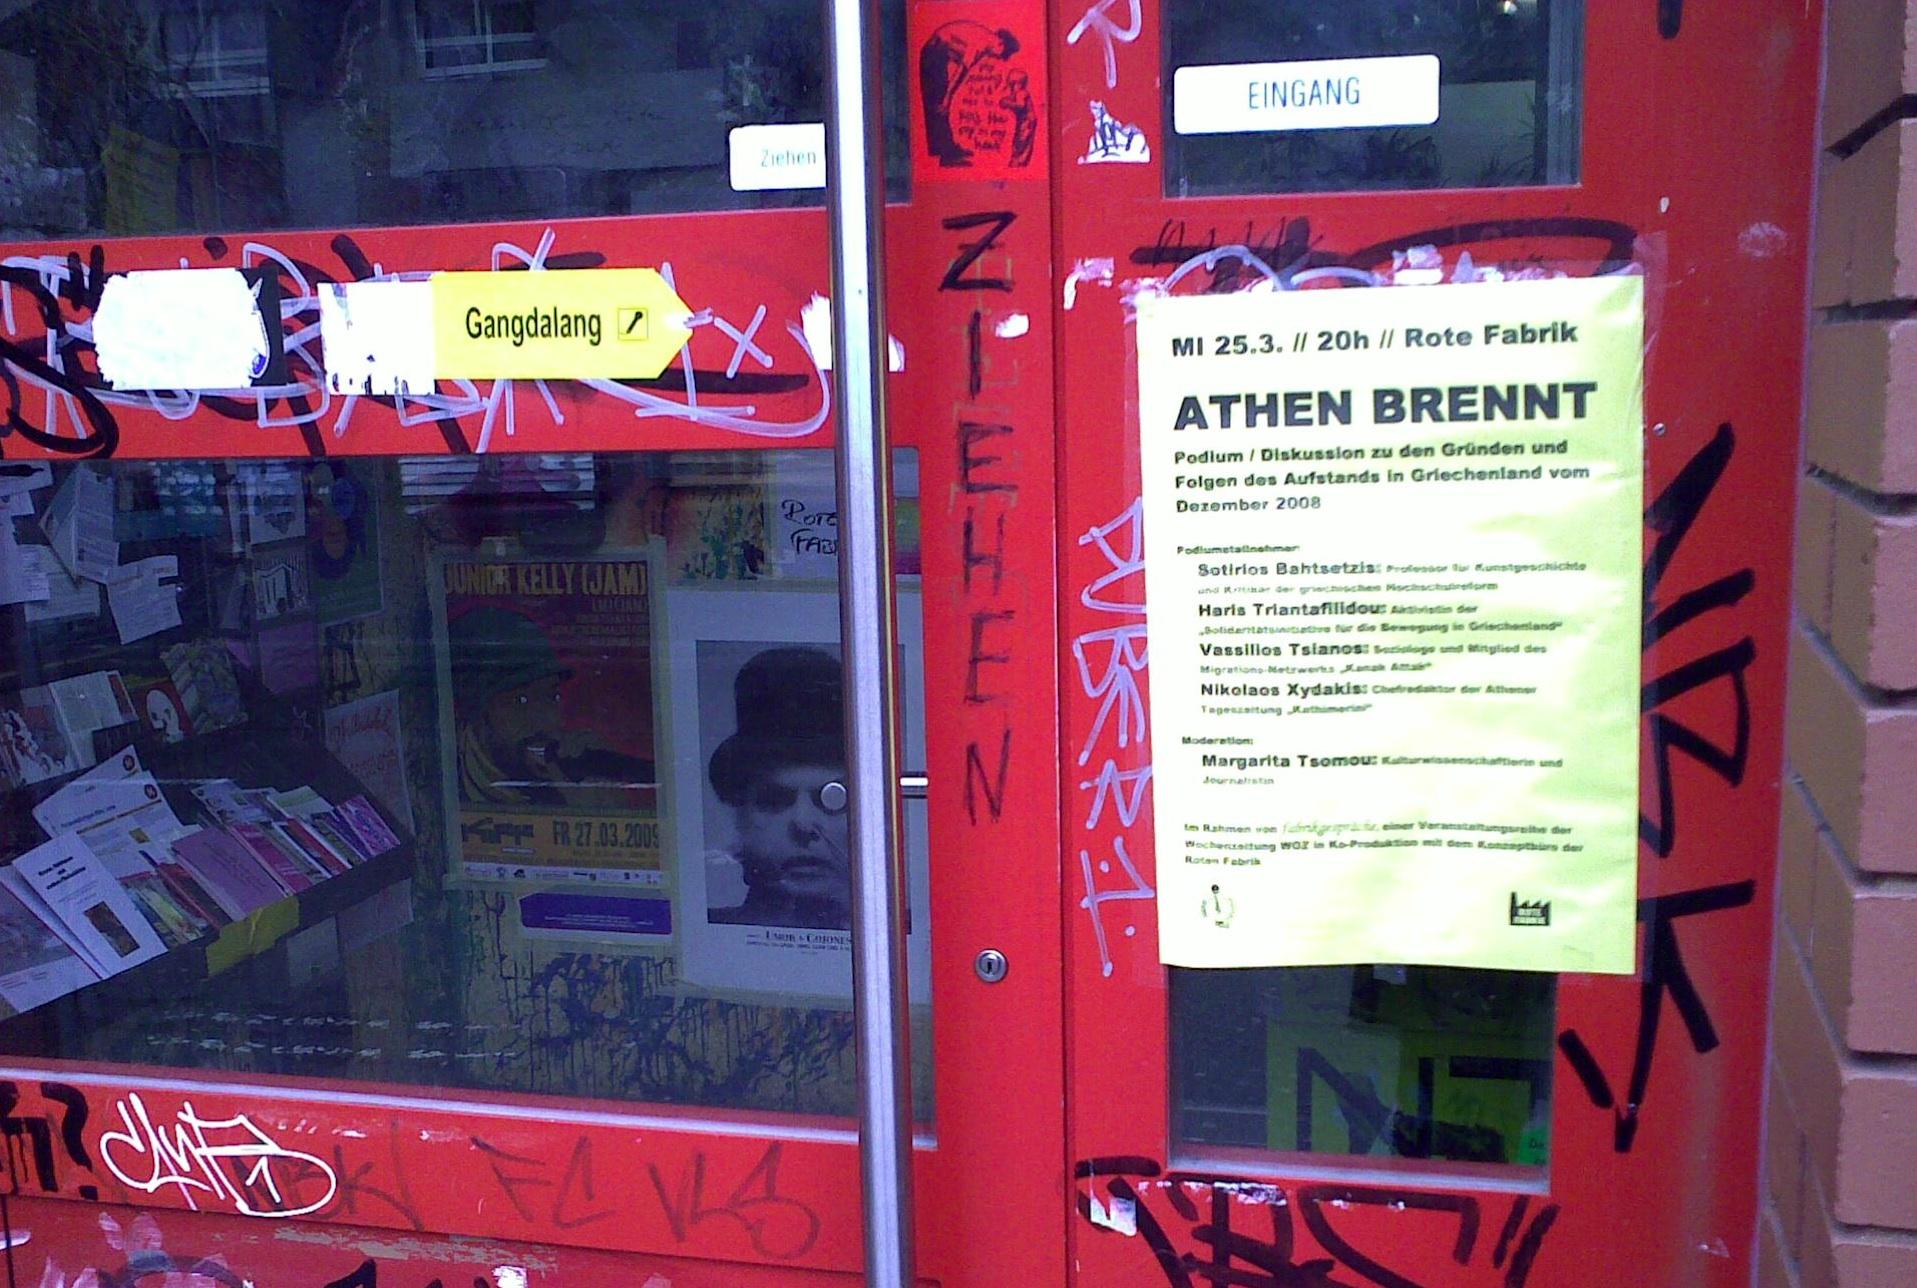 Athen brennt. Am Rote Fabrik.